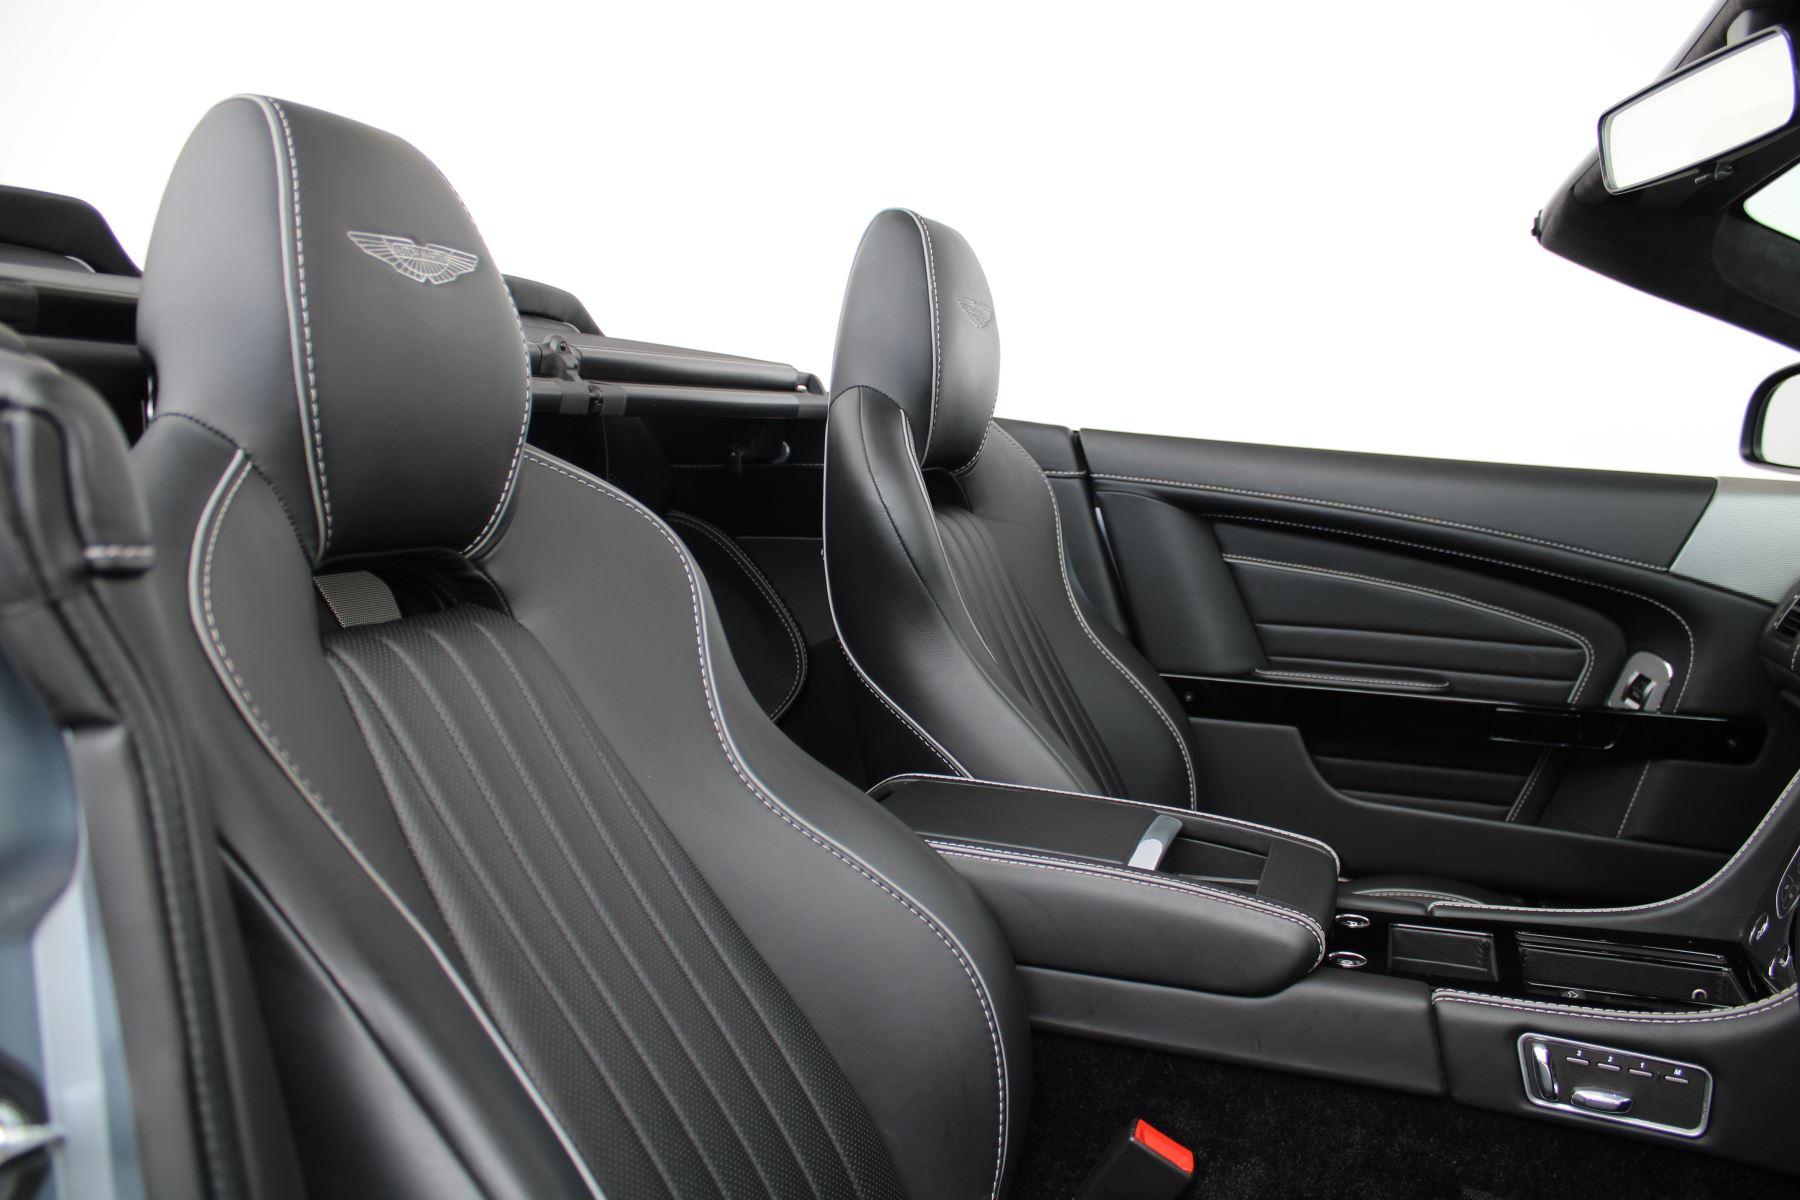 Aston Martin DB9 V12 GT 2dr Volante Skyfall Silver image 5